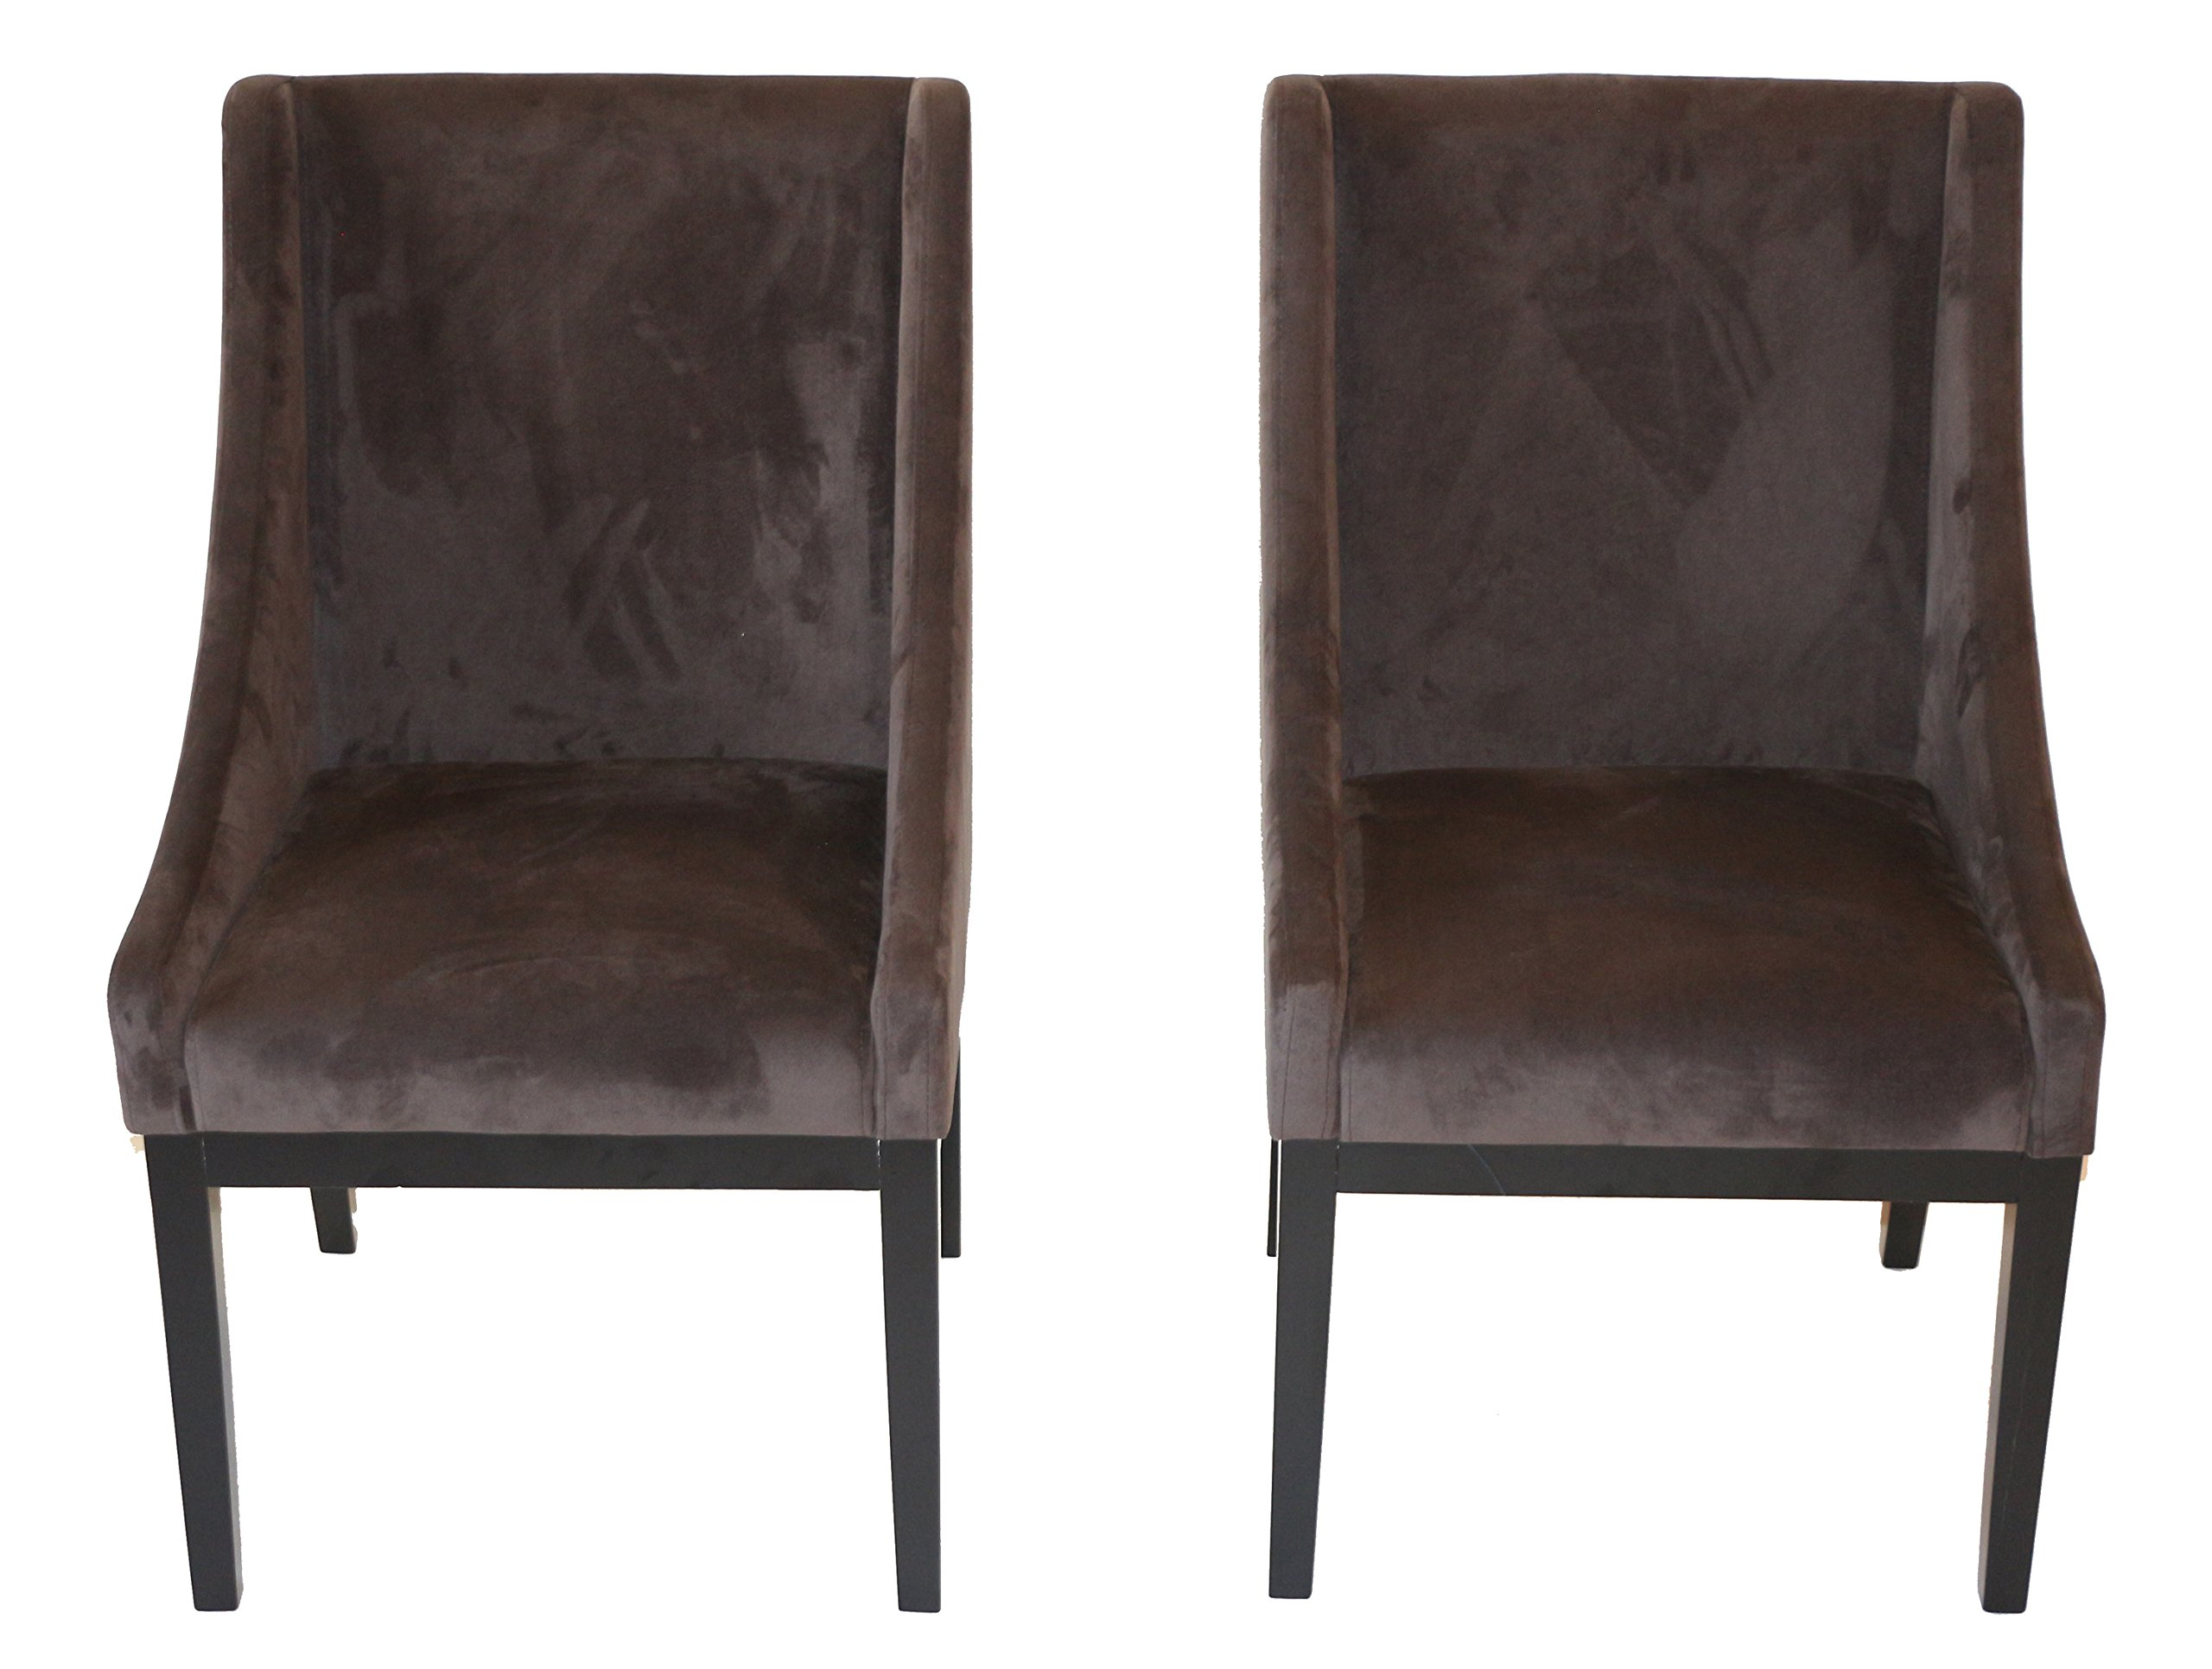 Home Life Contemporary Microfiber Modern Sofa Arm Chairs Set of 2